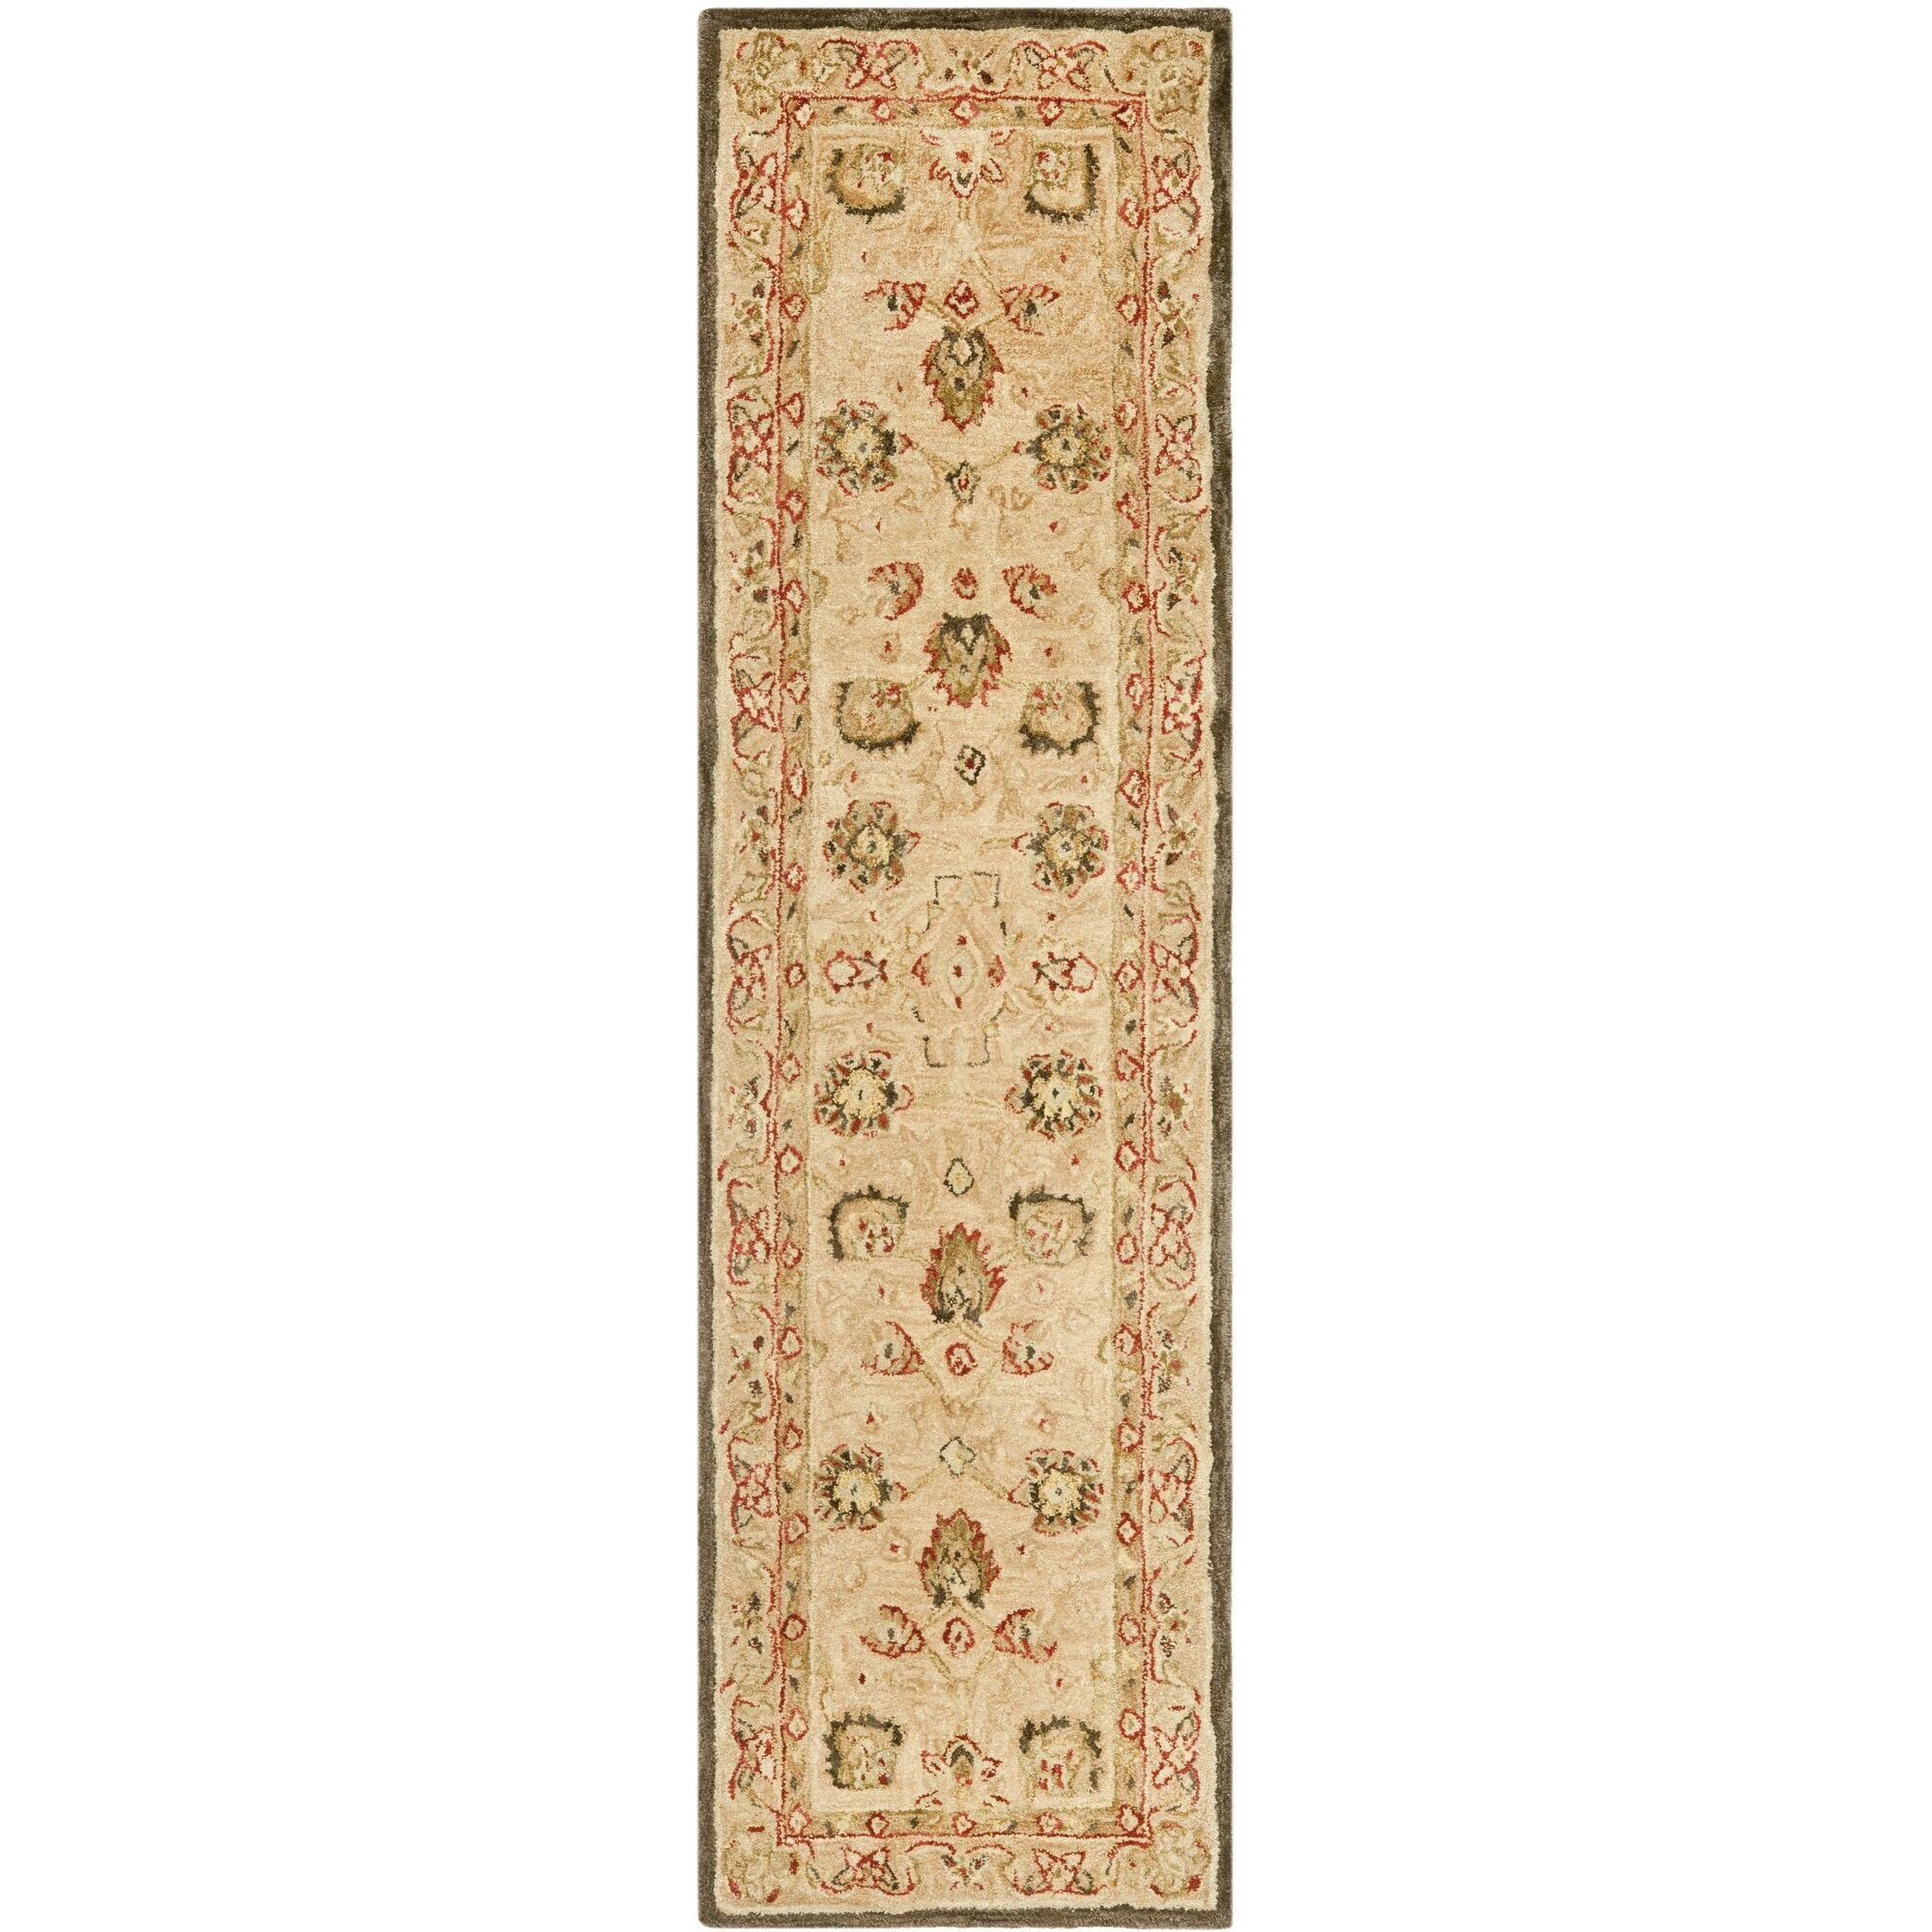 Anatolia Hand-Woven Wool Brown Area Rug Rug Size: Runner 2'3